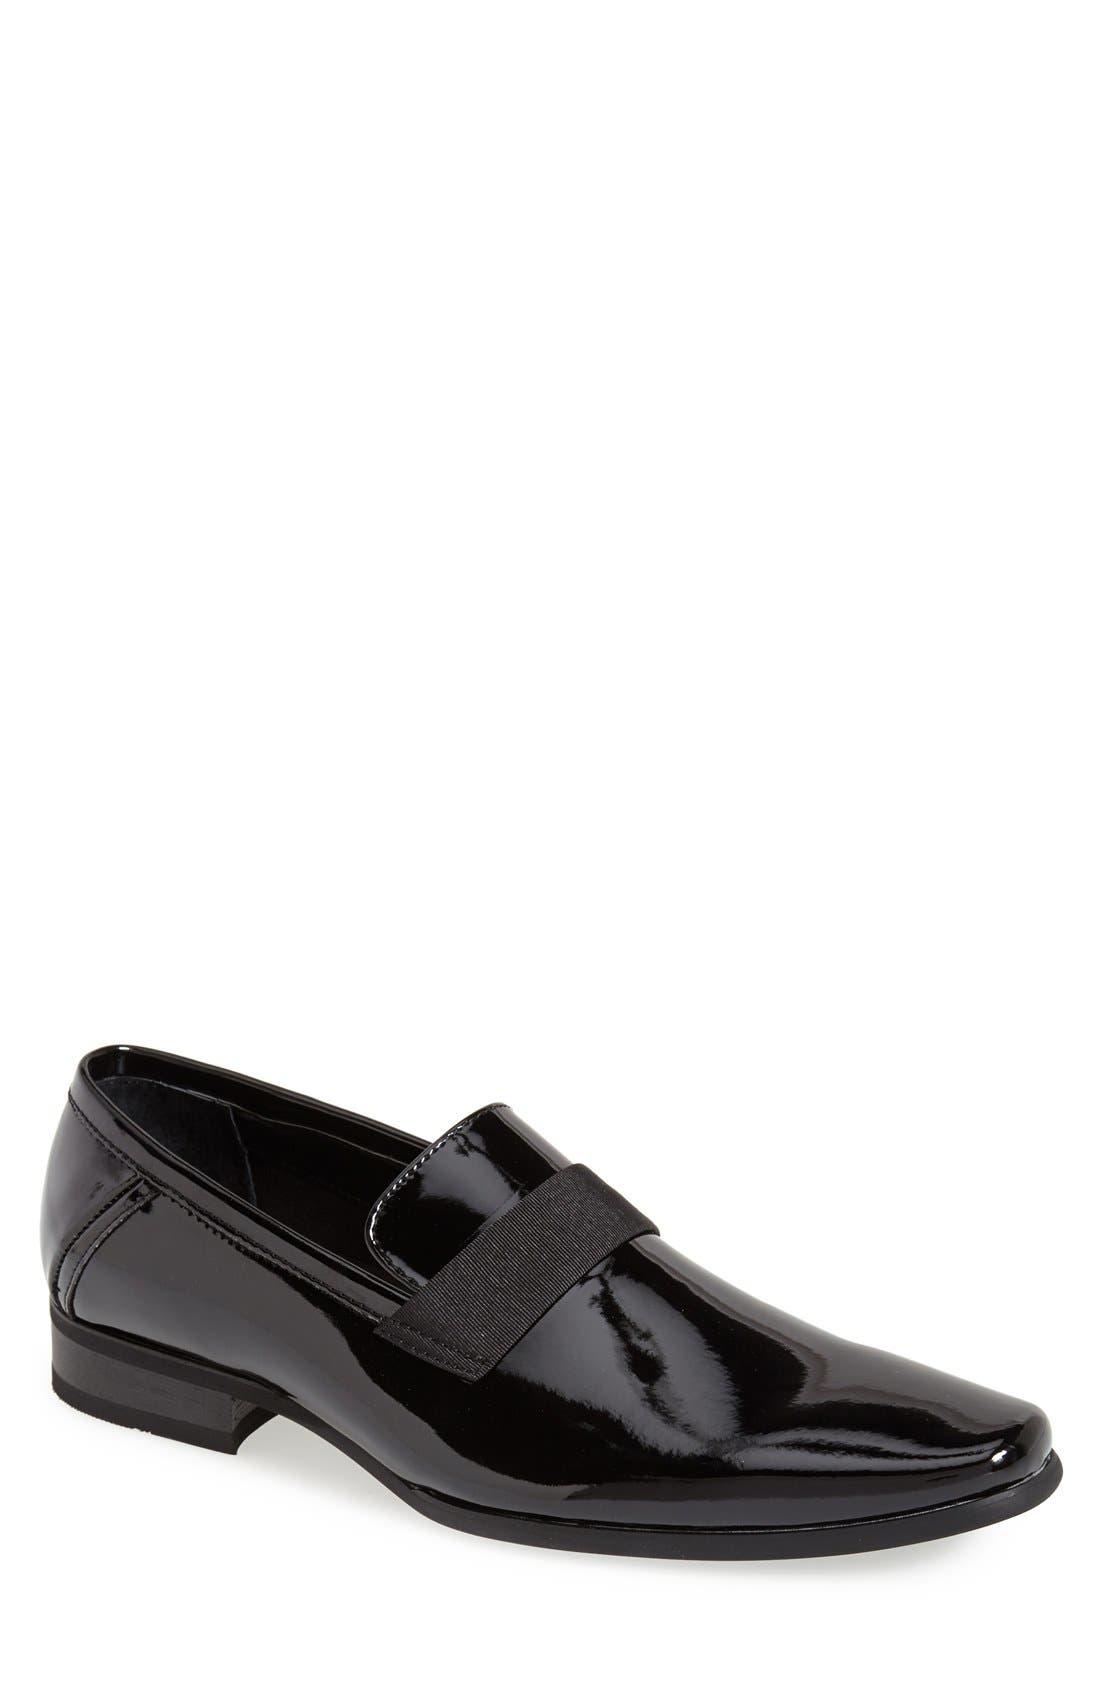 Main Image - Calvin Klein 'Bernard' Venetian Loafer (Men)